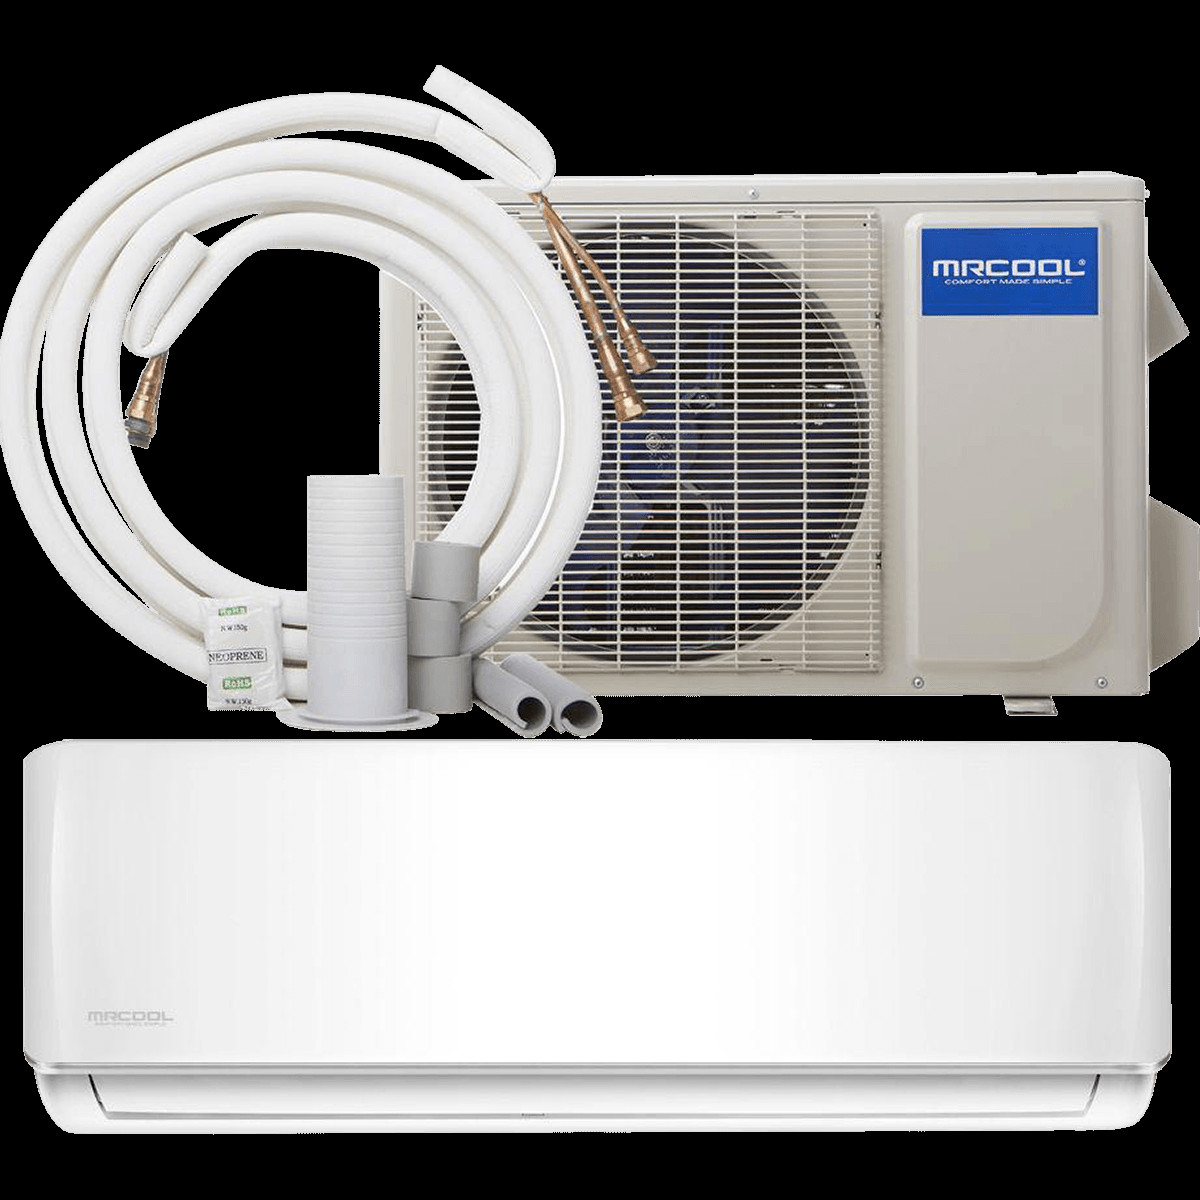 Best ideas about Mr Cool DIY Mini Split Review . Save or Pin MRCOOL DIY 12 000 BTU 115V Mini Split Heat Pump Now.